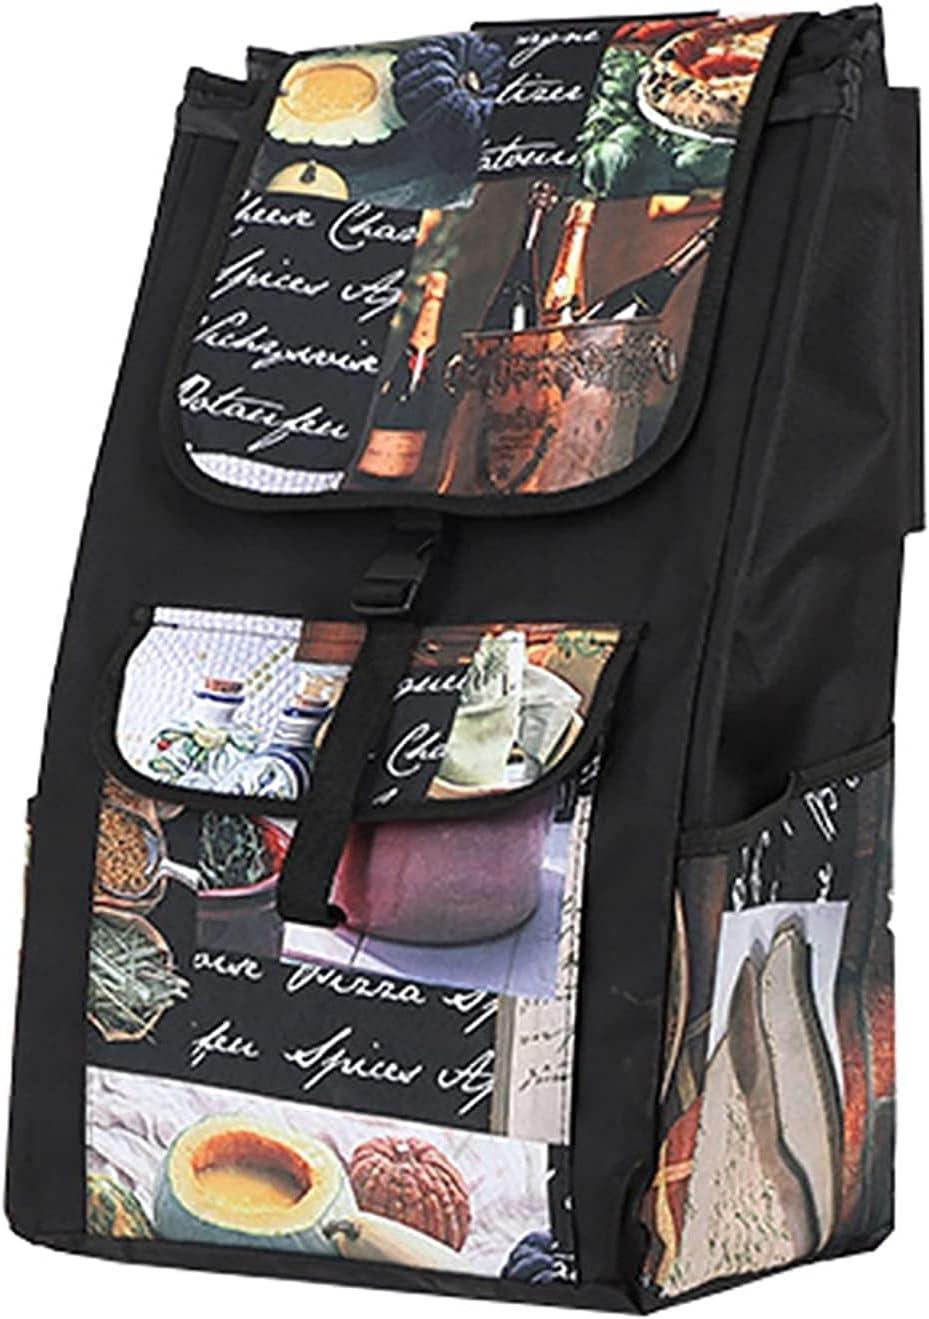 FOLDABLE 쇼핑 트롤리 라 접이식 식료품 쇼핑 카트 바구 대체 가방 | 옥스포드 피복한 방수 쇼핑백 양면 예비 부대 대용량 49L